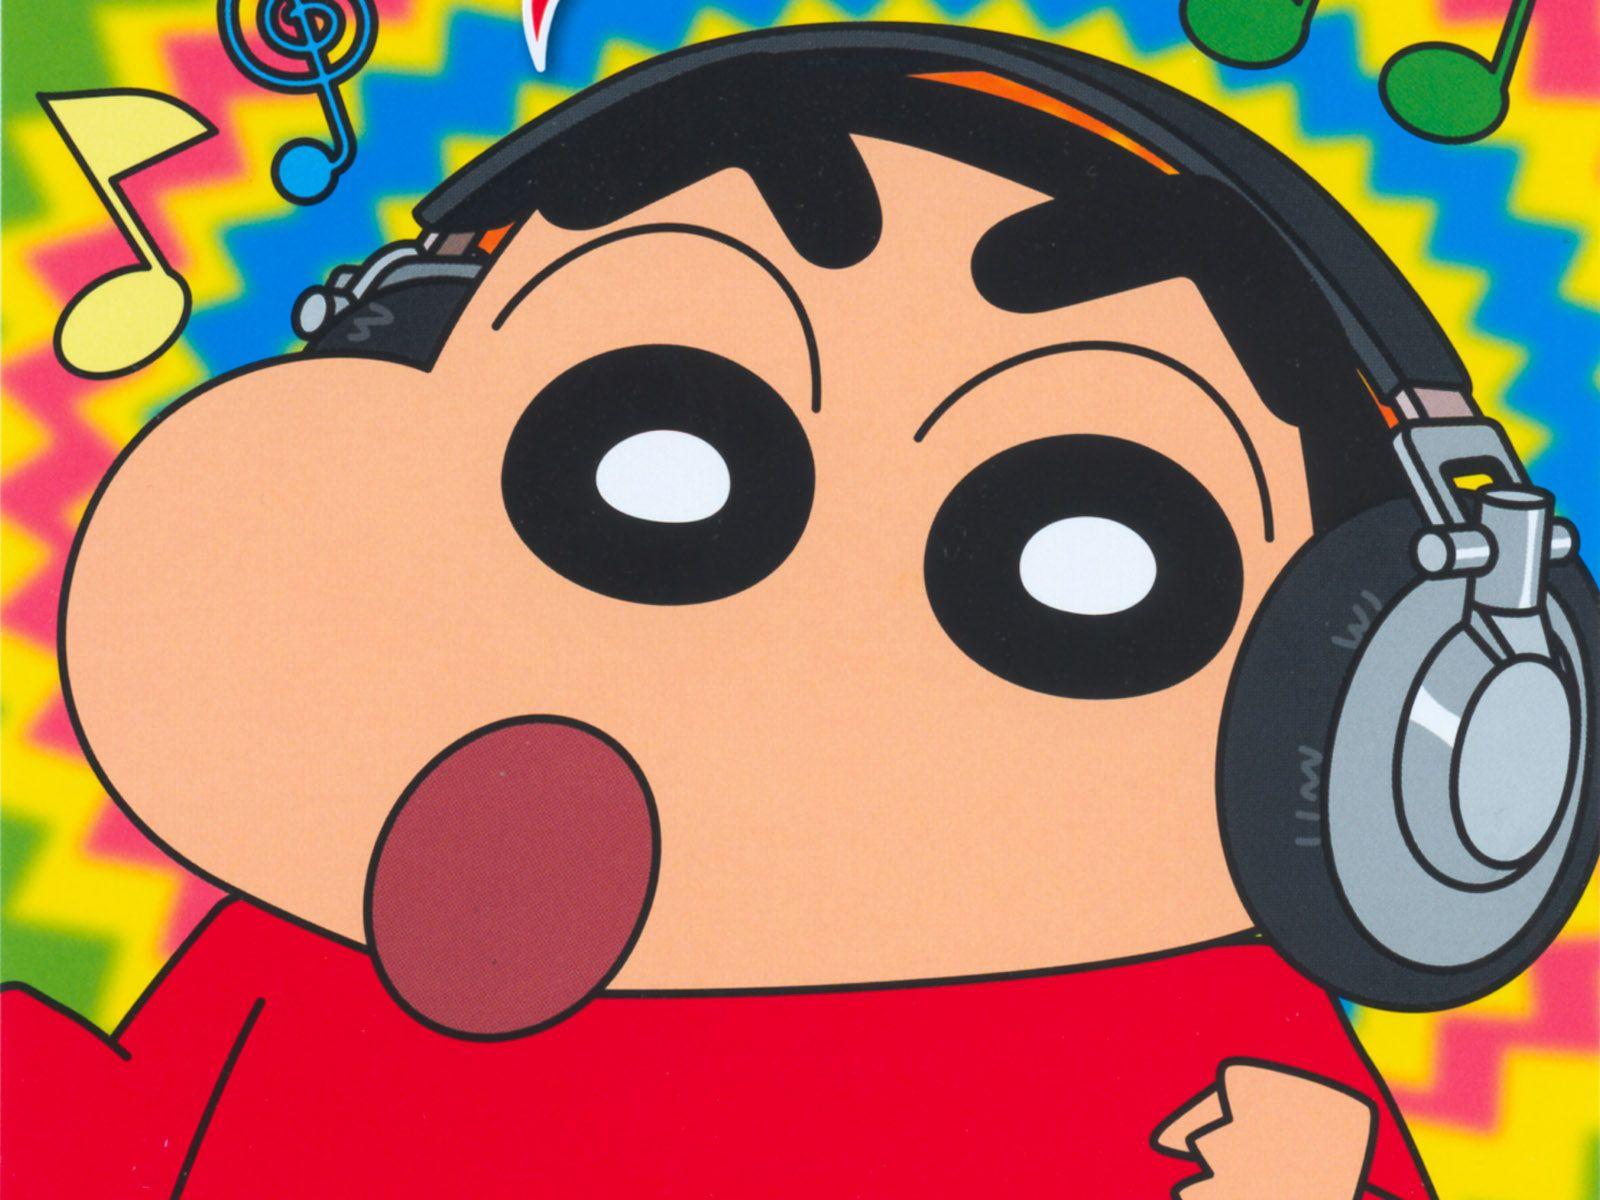 Crayon shin chan wallpaper 1080p anime wallpapers